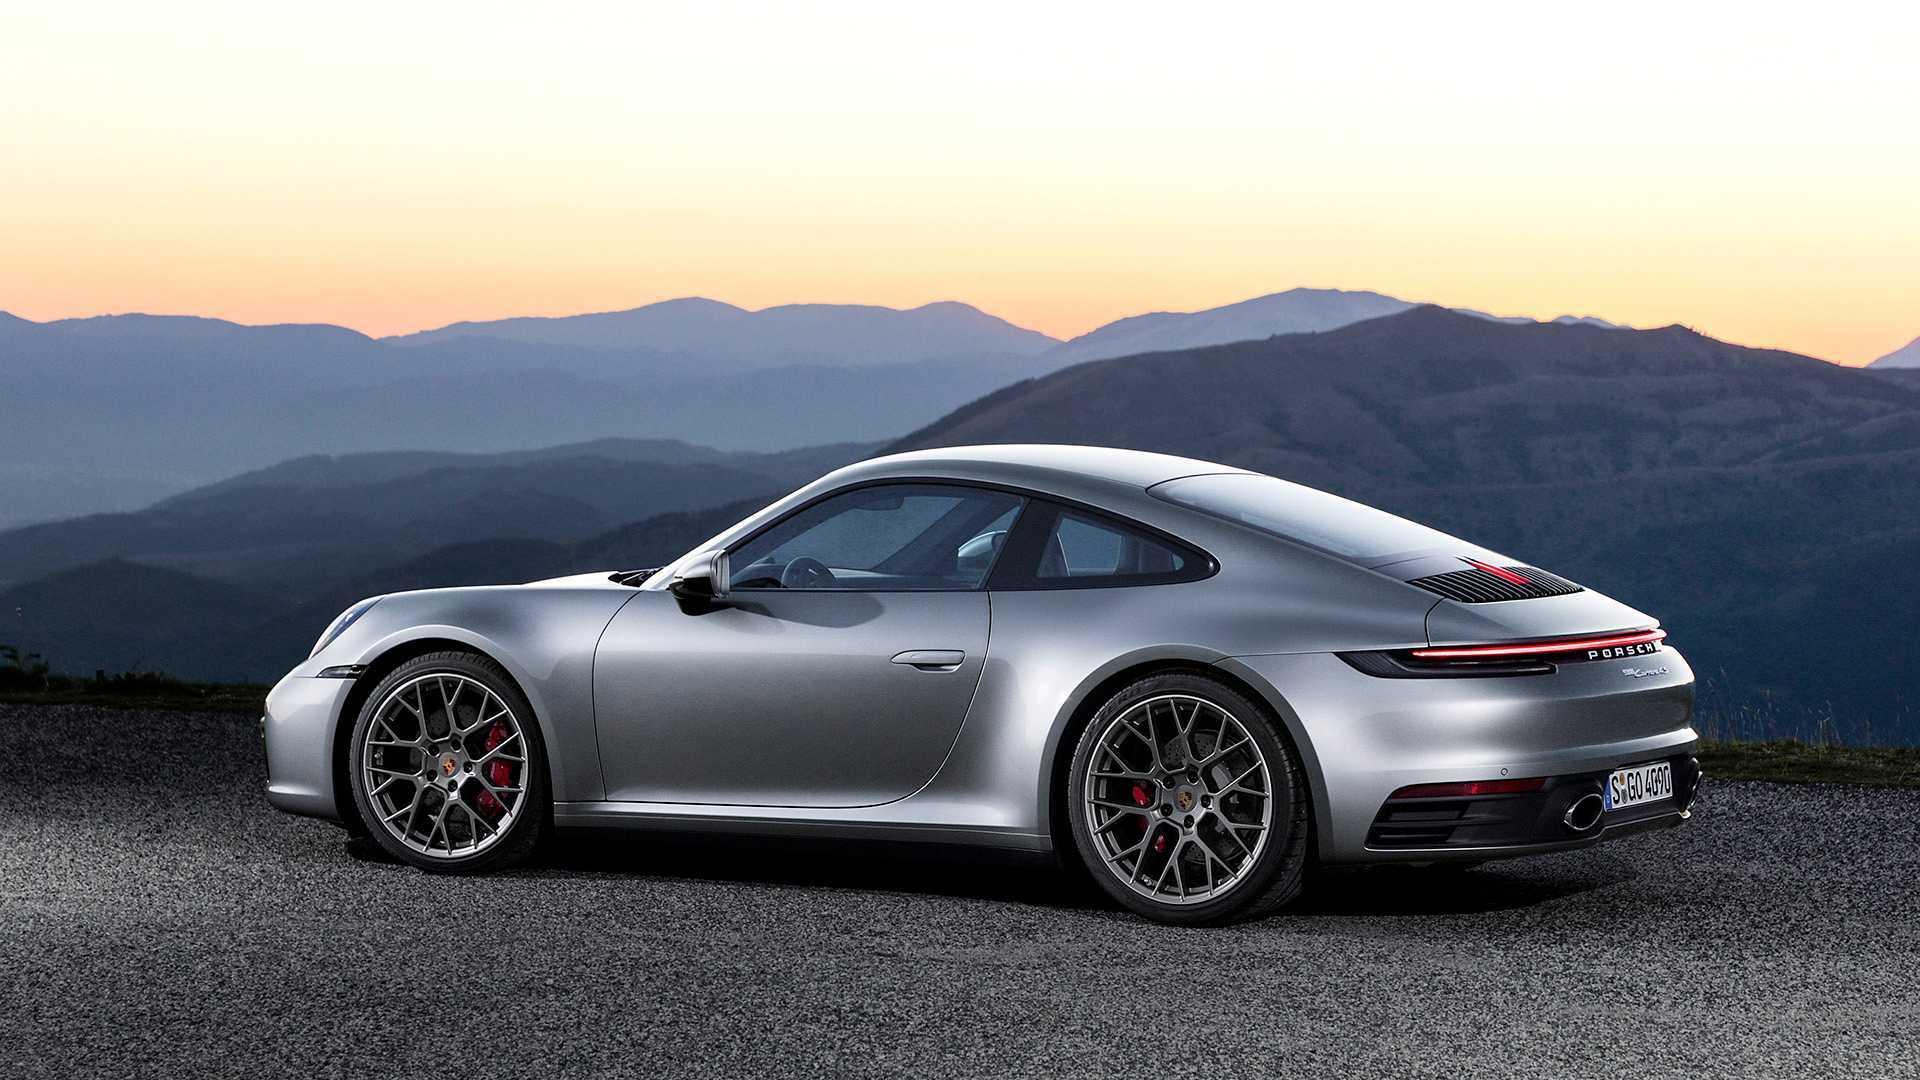 2020 Porsche 911 Carrera S Carrera 4s Debut With 443 Hp